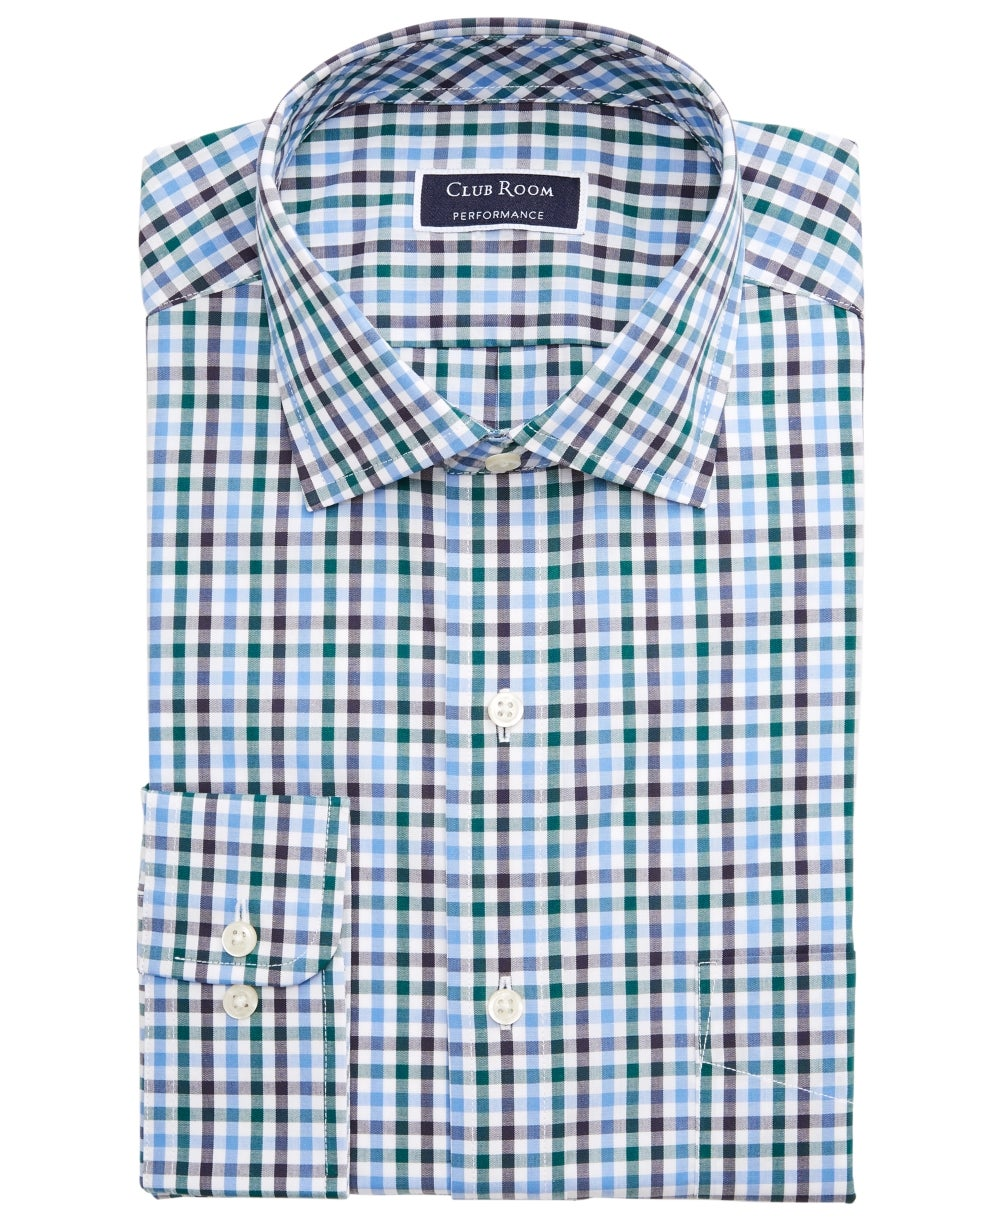 Club Room Mens Dress Shirt Blue Size 18 1/2 Regular Fit Gingham Print